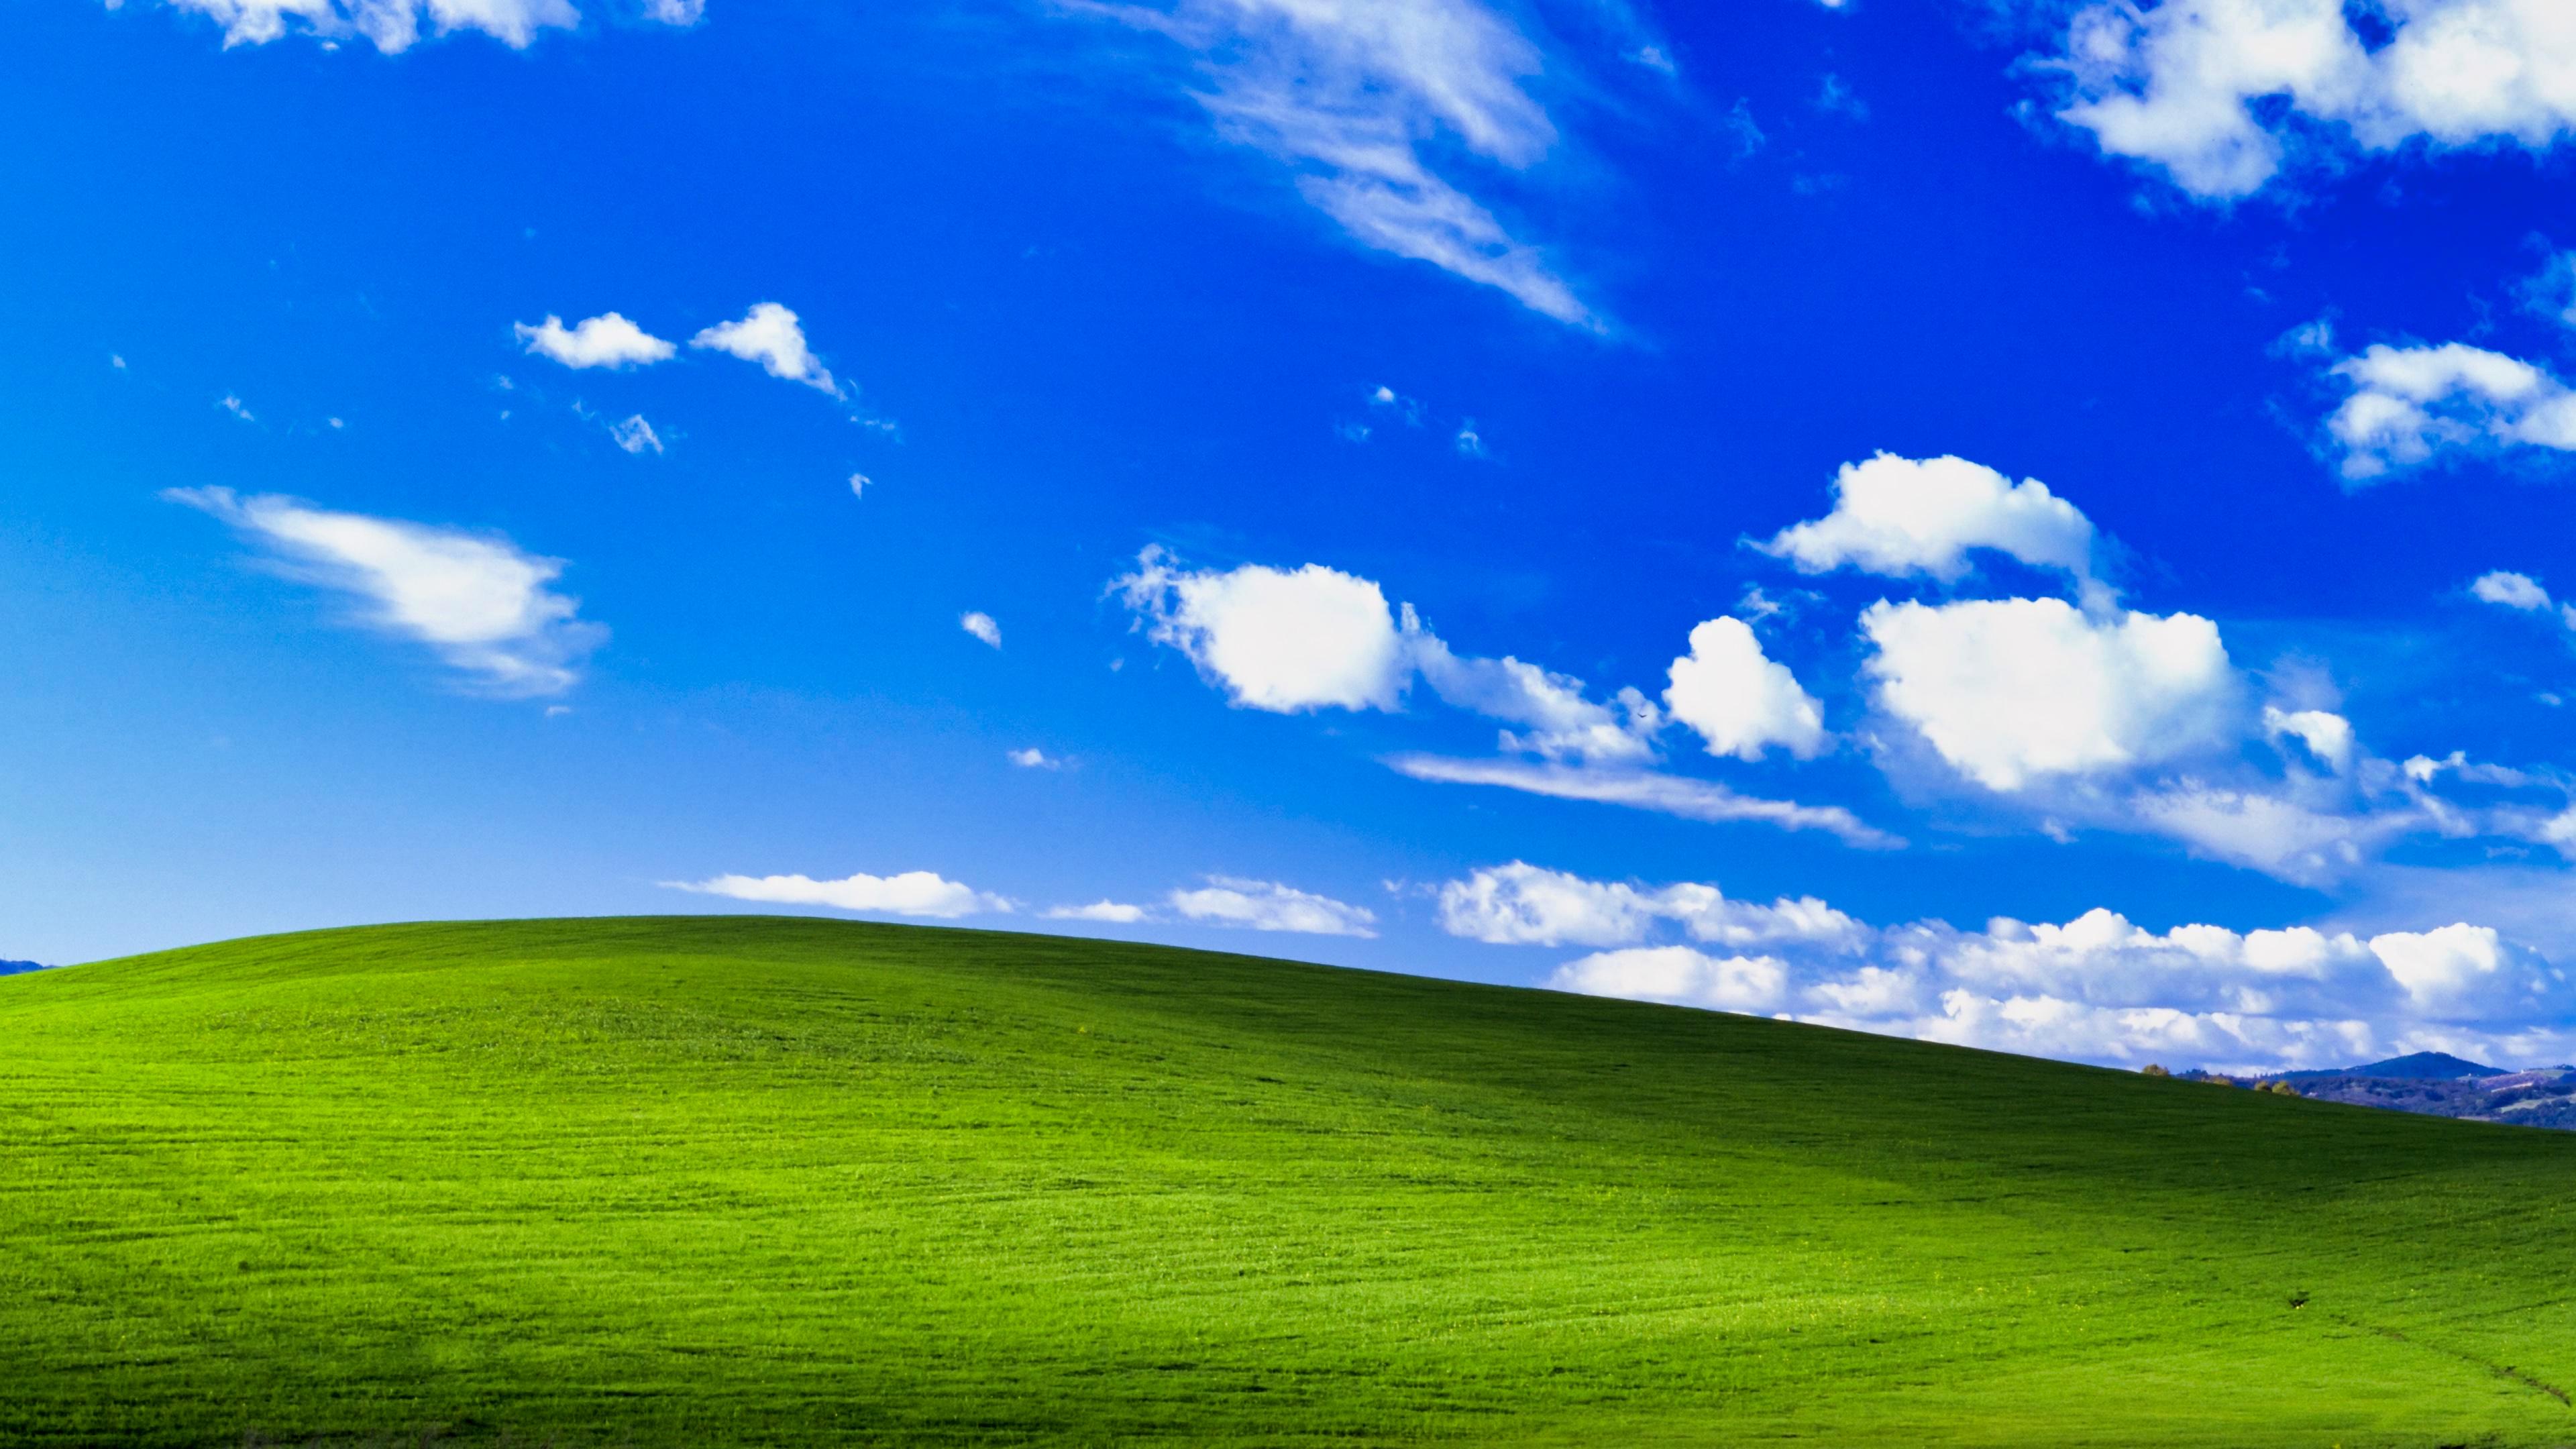 Original Windows Xp Wallpaper In 4k 3840x2160 Buzz Uploads